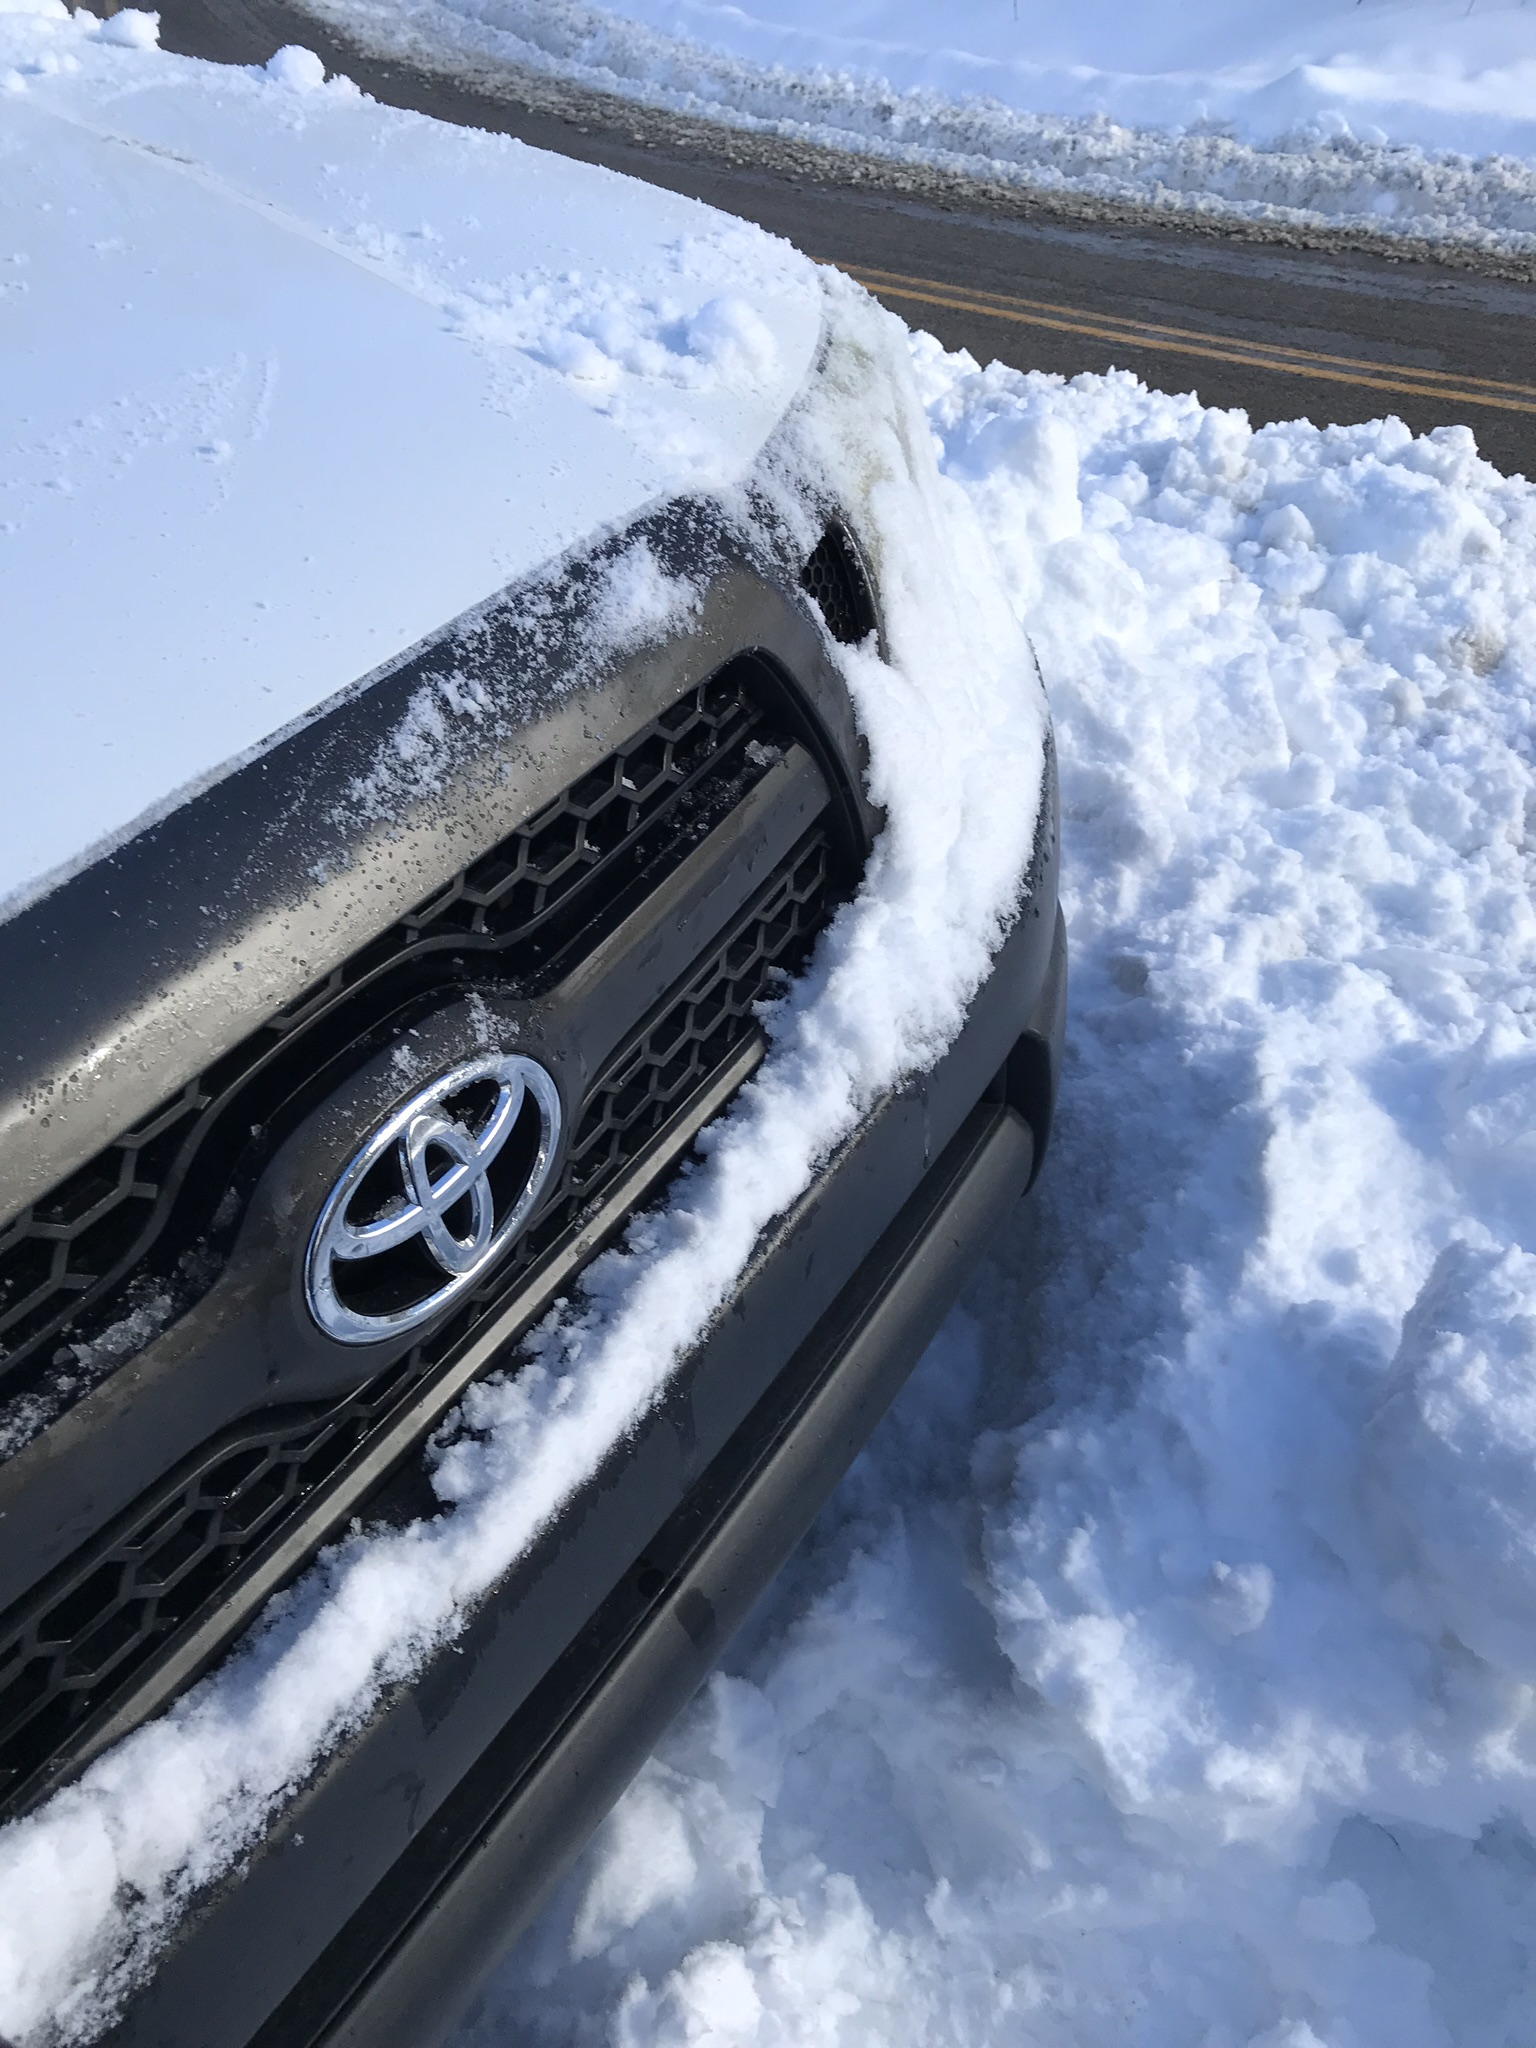 My pickup truck, stuck